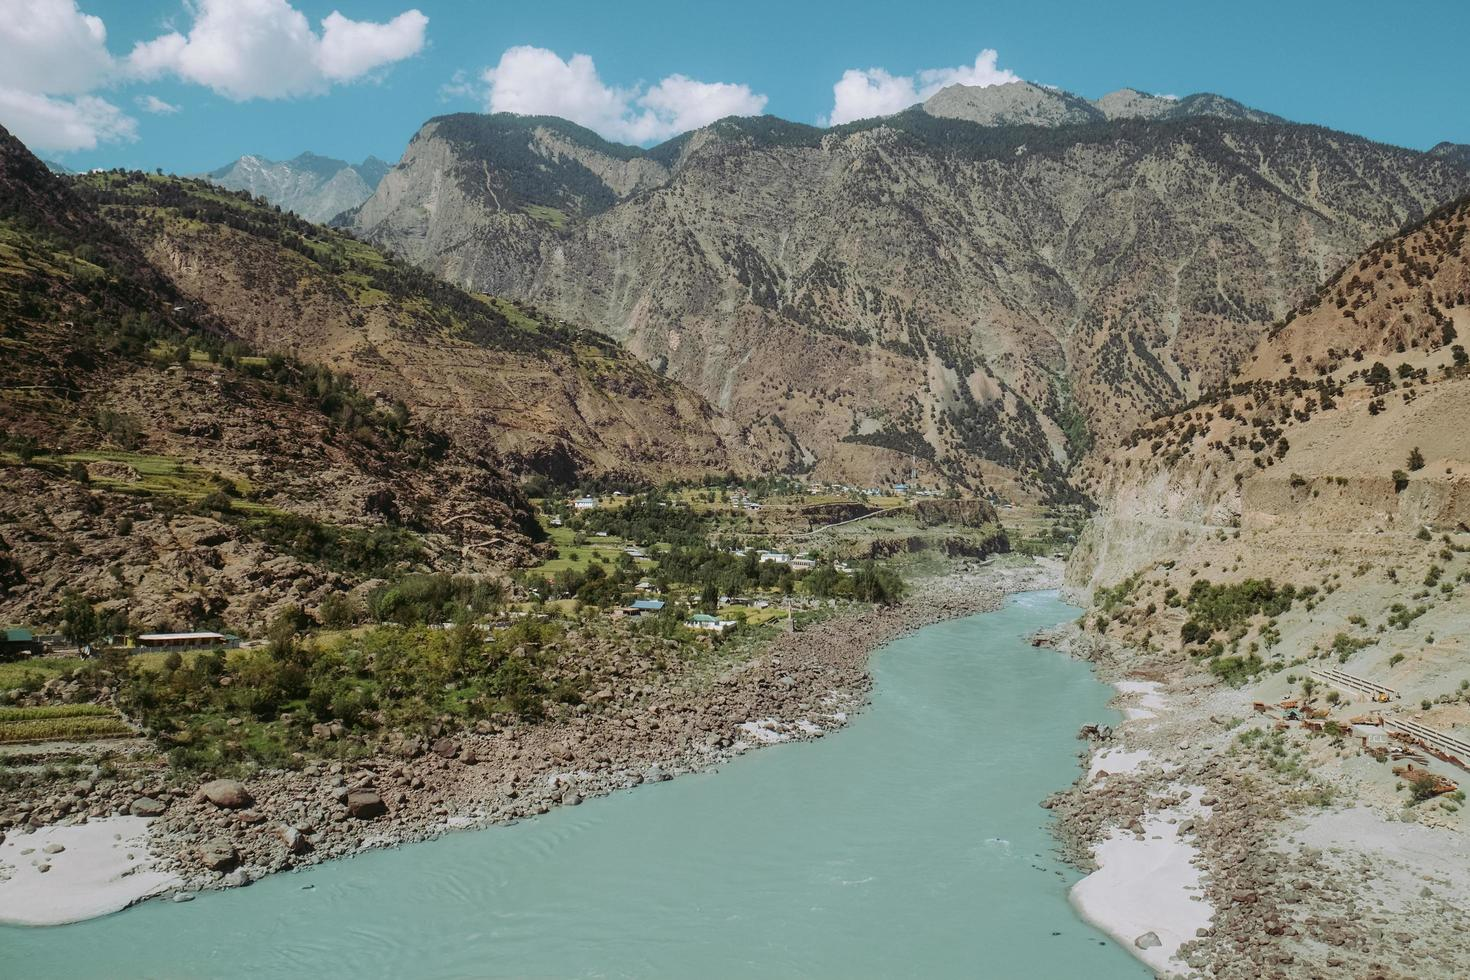 Indus Fluss fließt durch Berge foto